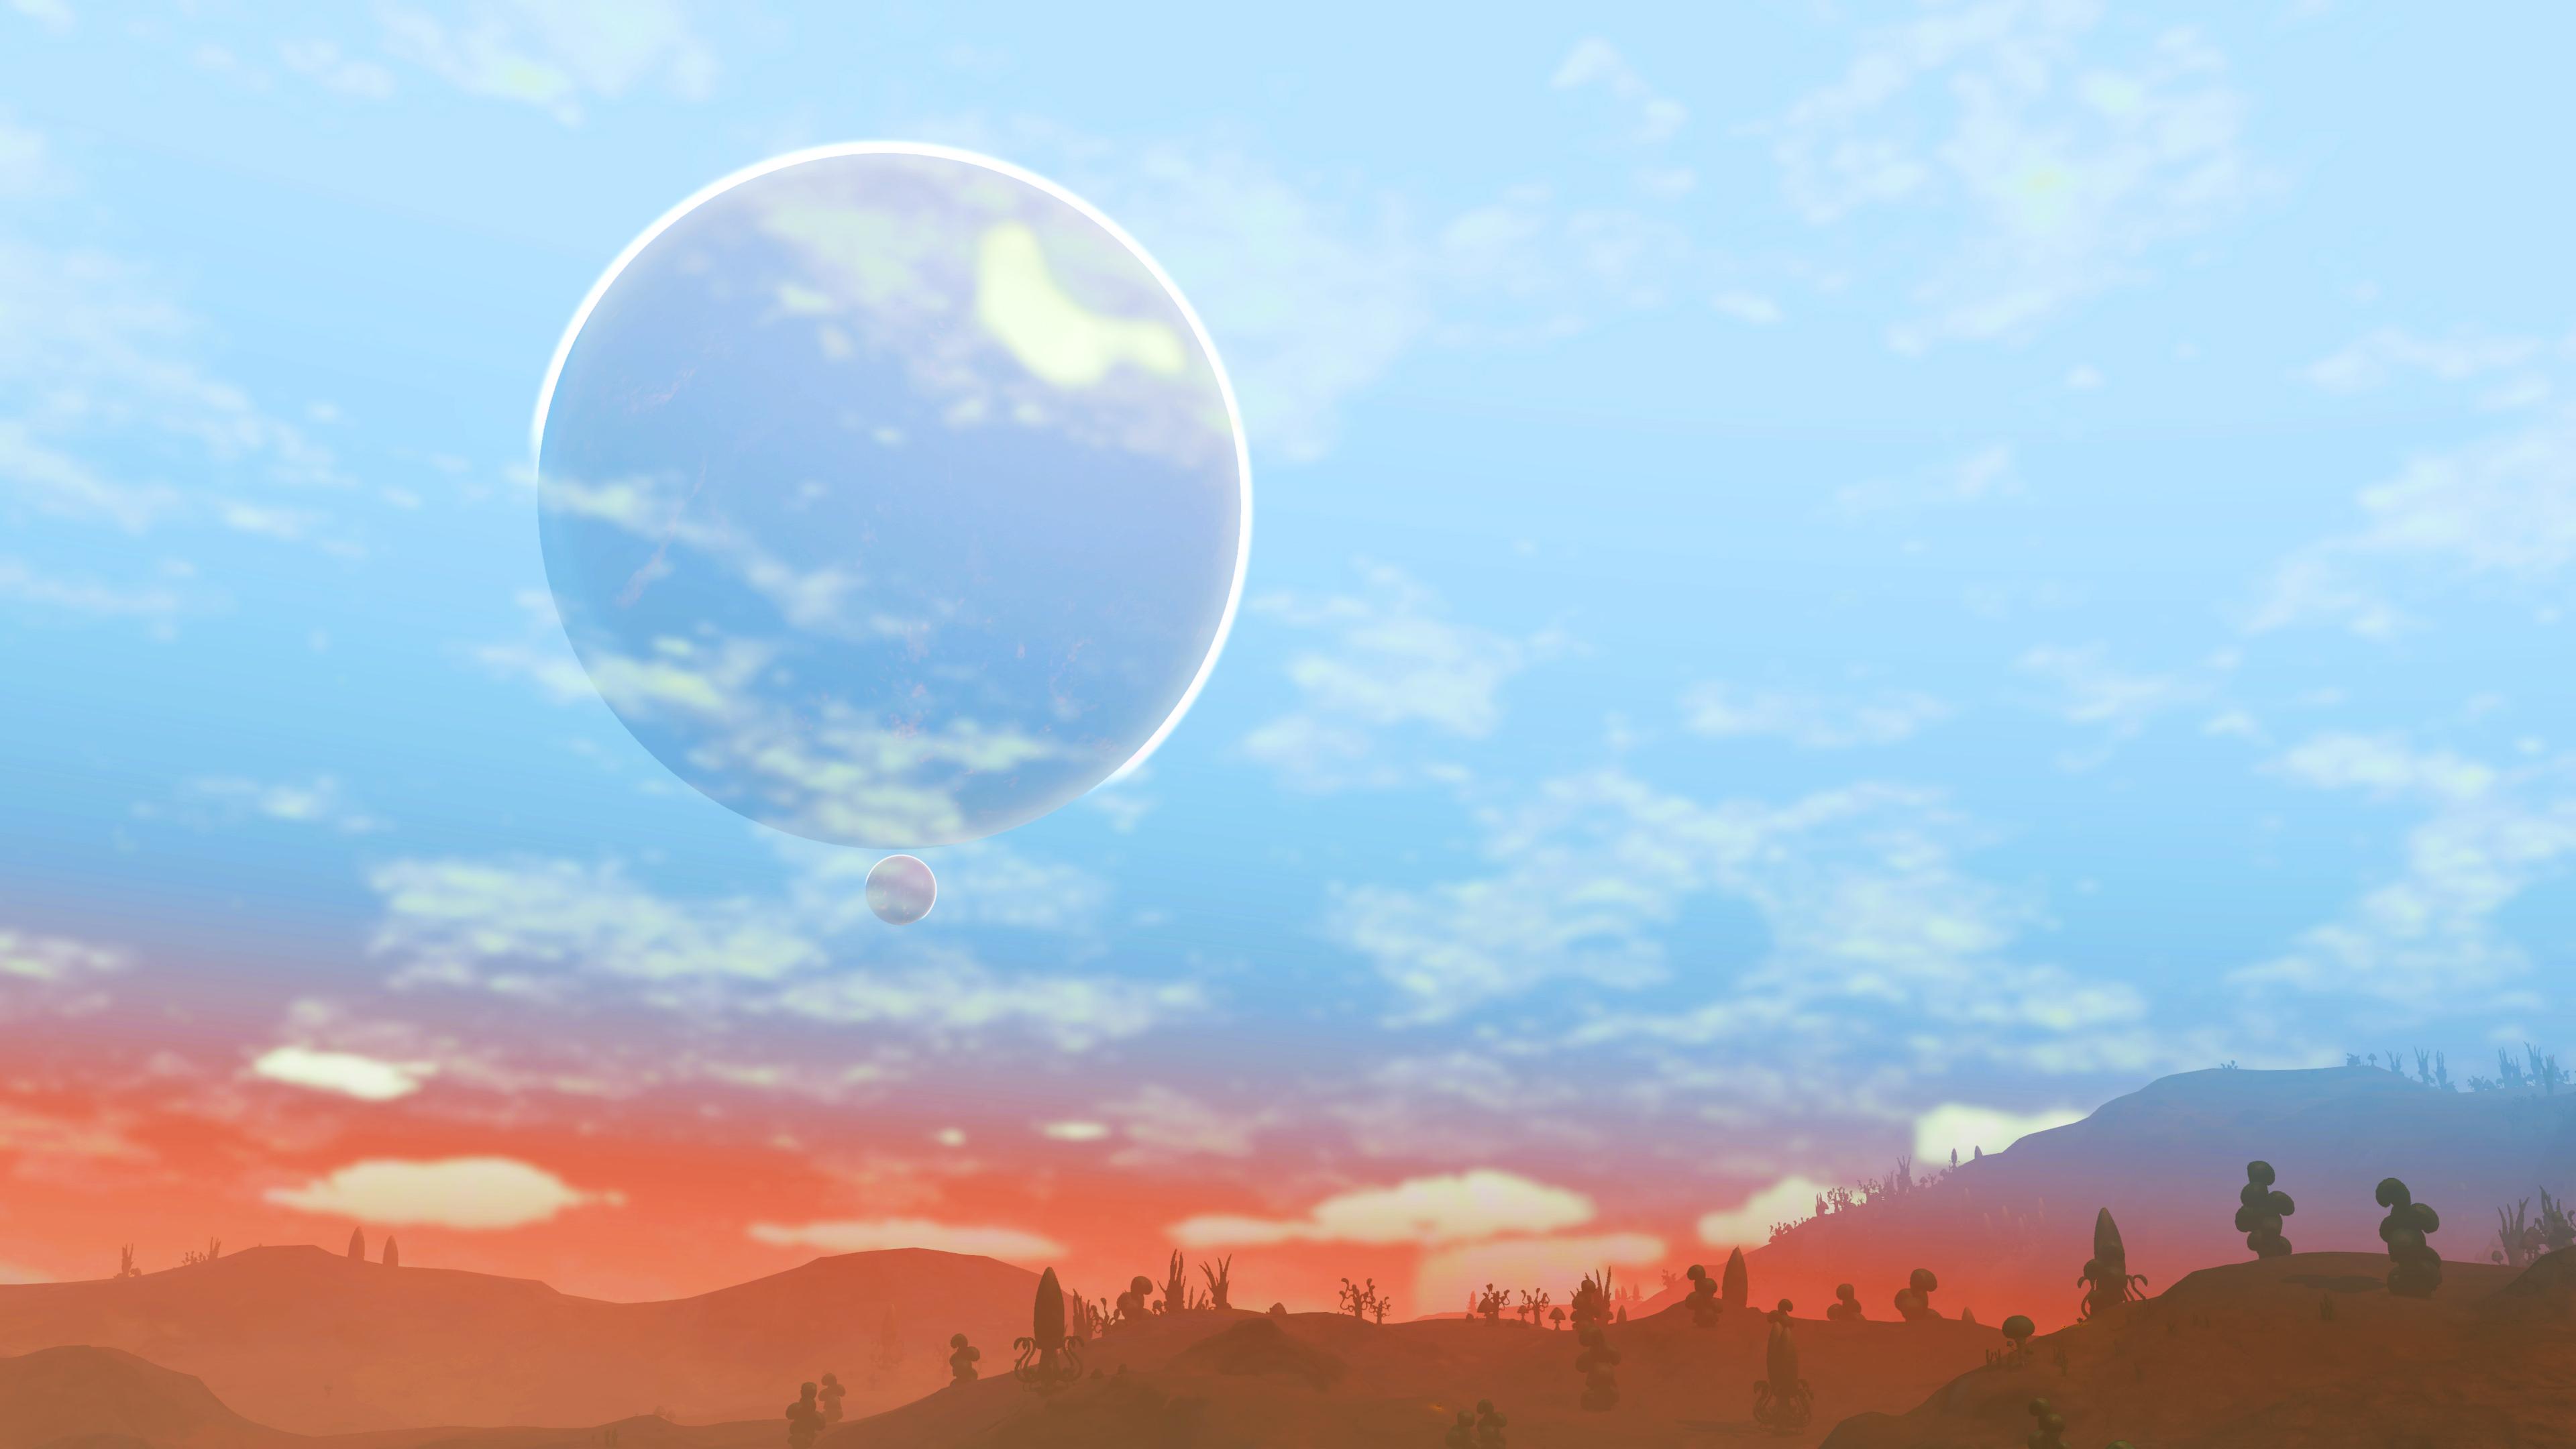 No Man S Sky 4k Wallpaper: No Mans Sky Big And Small Moon 4k, HD Games, 4k Wallpapers